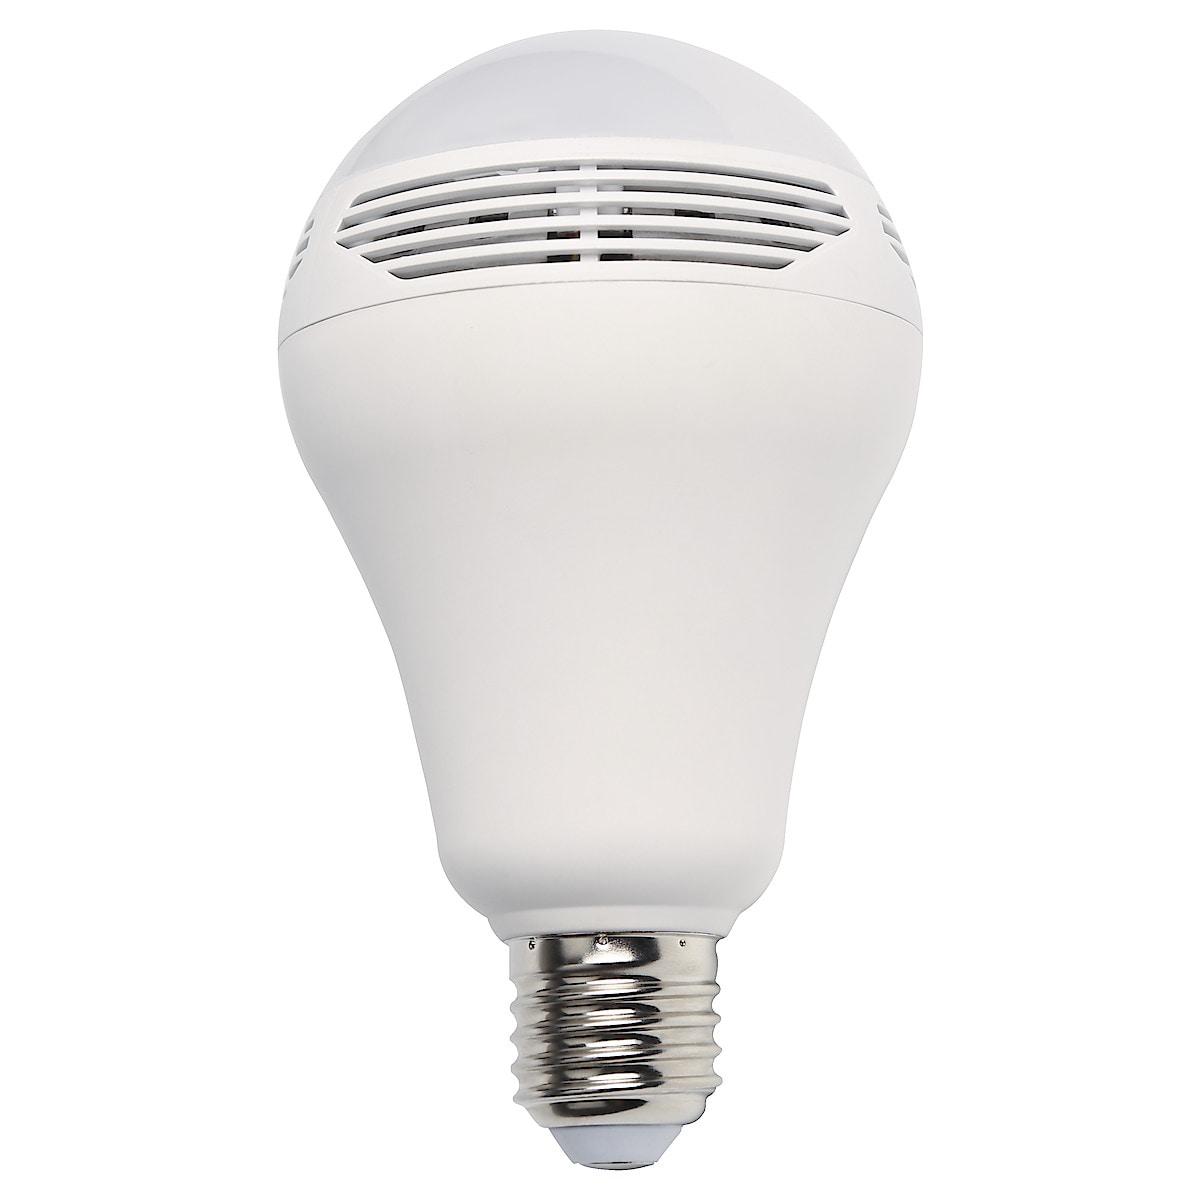 LED-lamppu jossa kaiutin